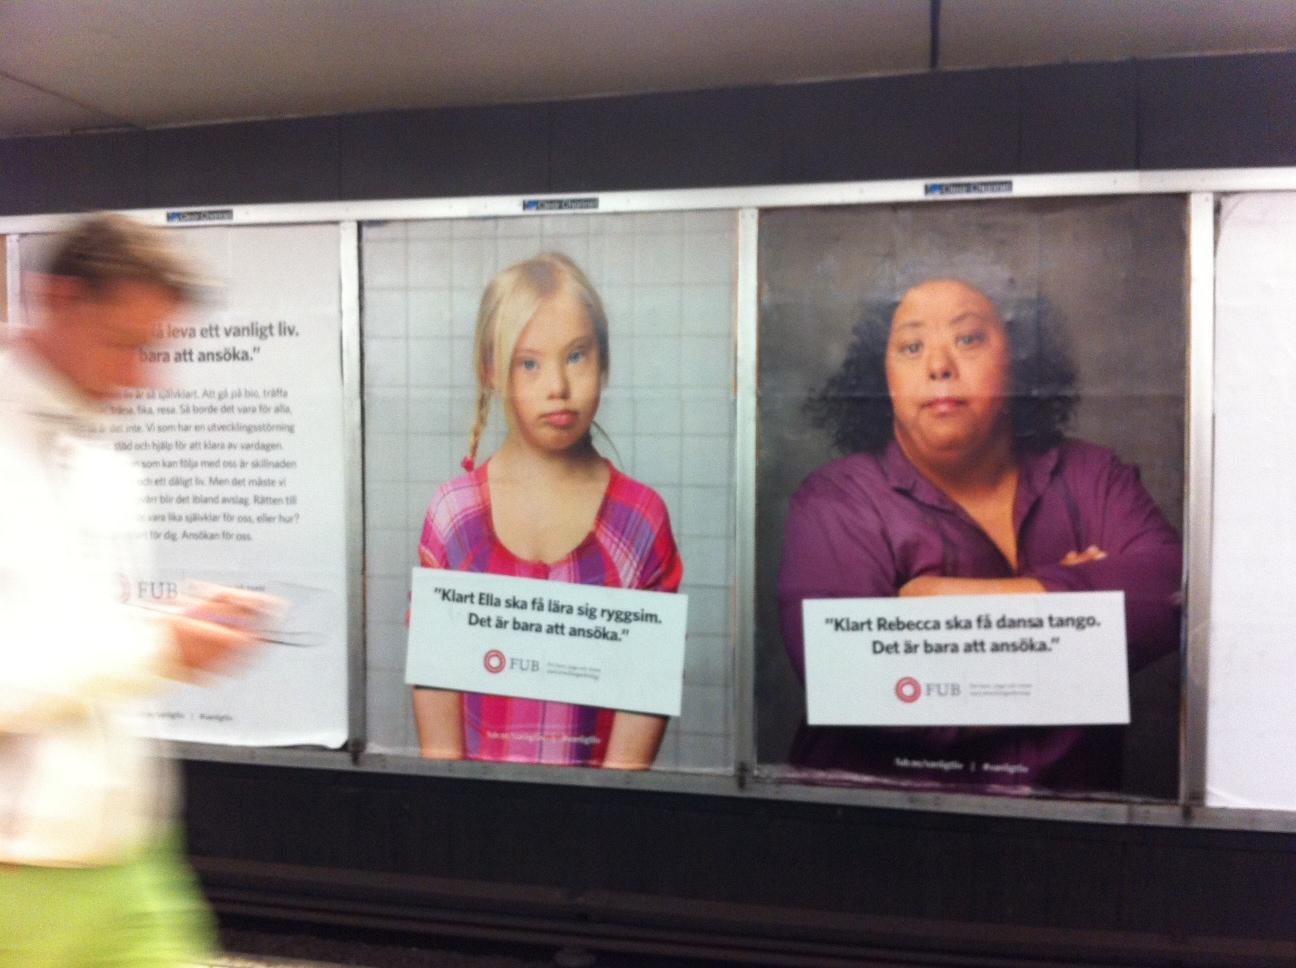 kampanjen_ansokan_om_ett_vanligt_liv_i_stockholms_tunnelbana